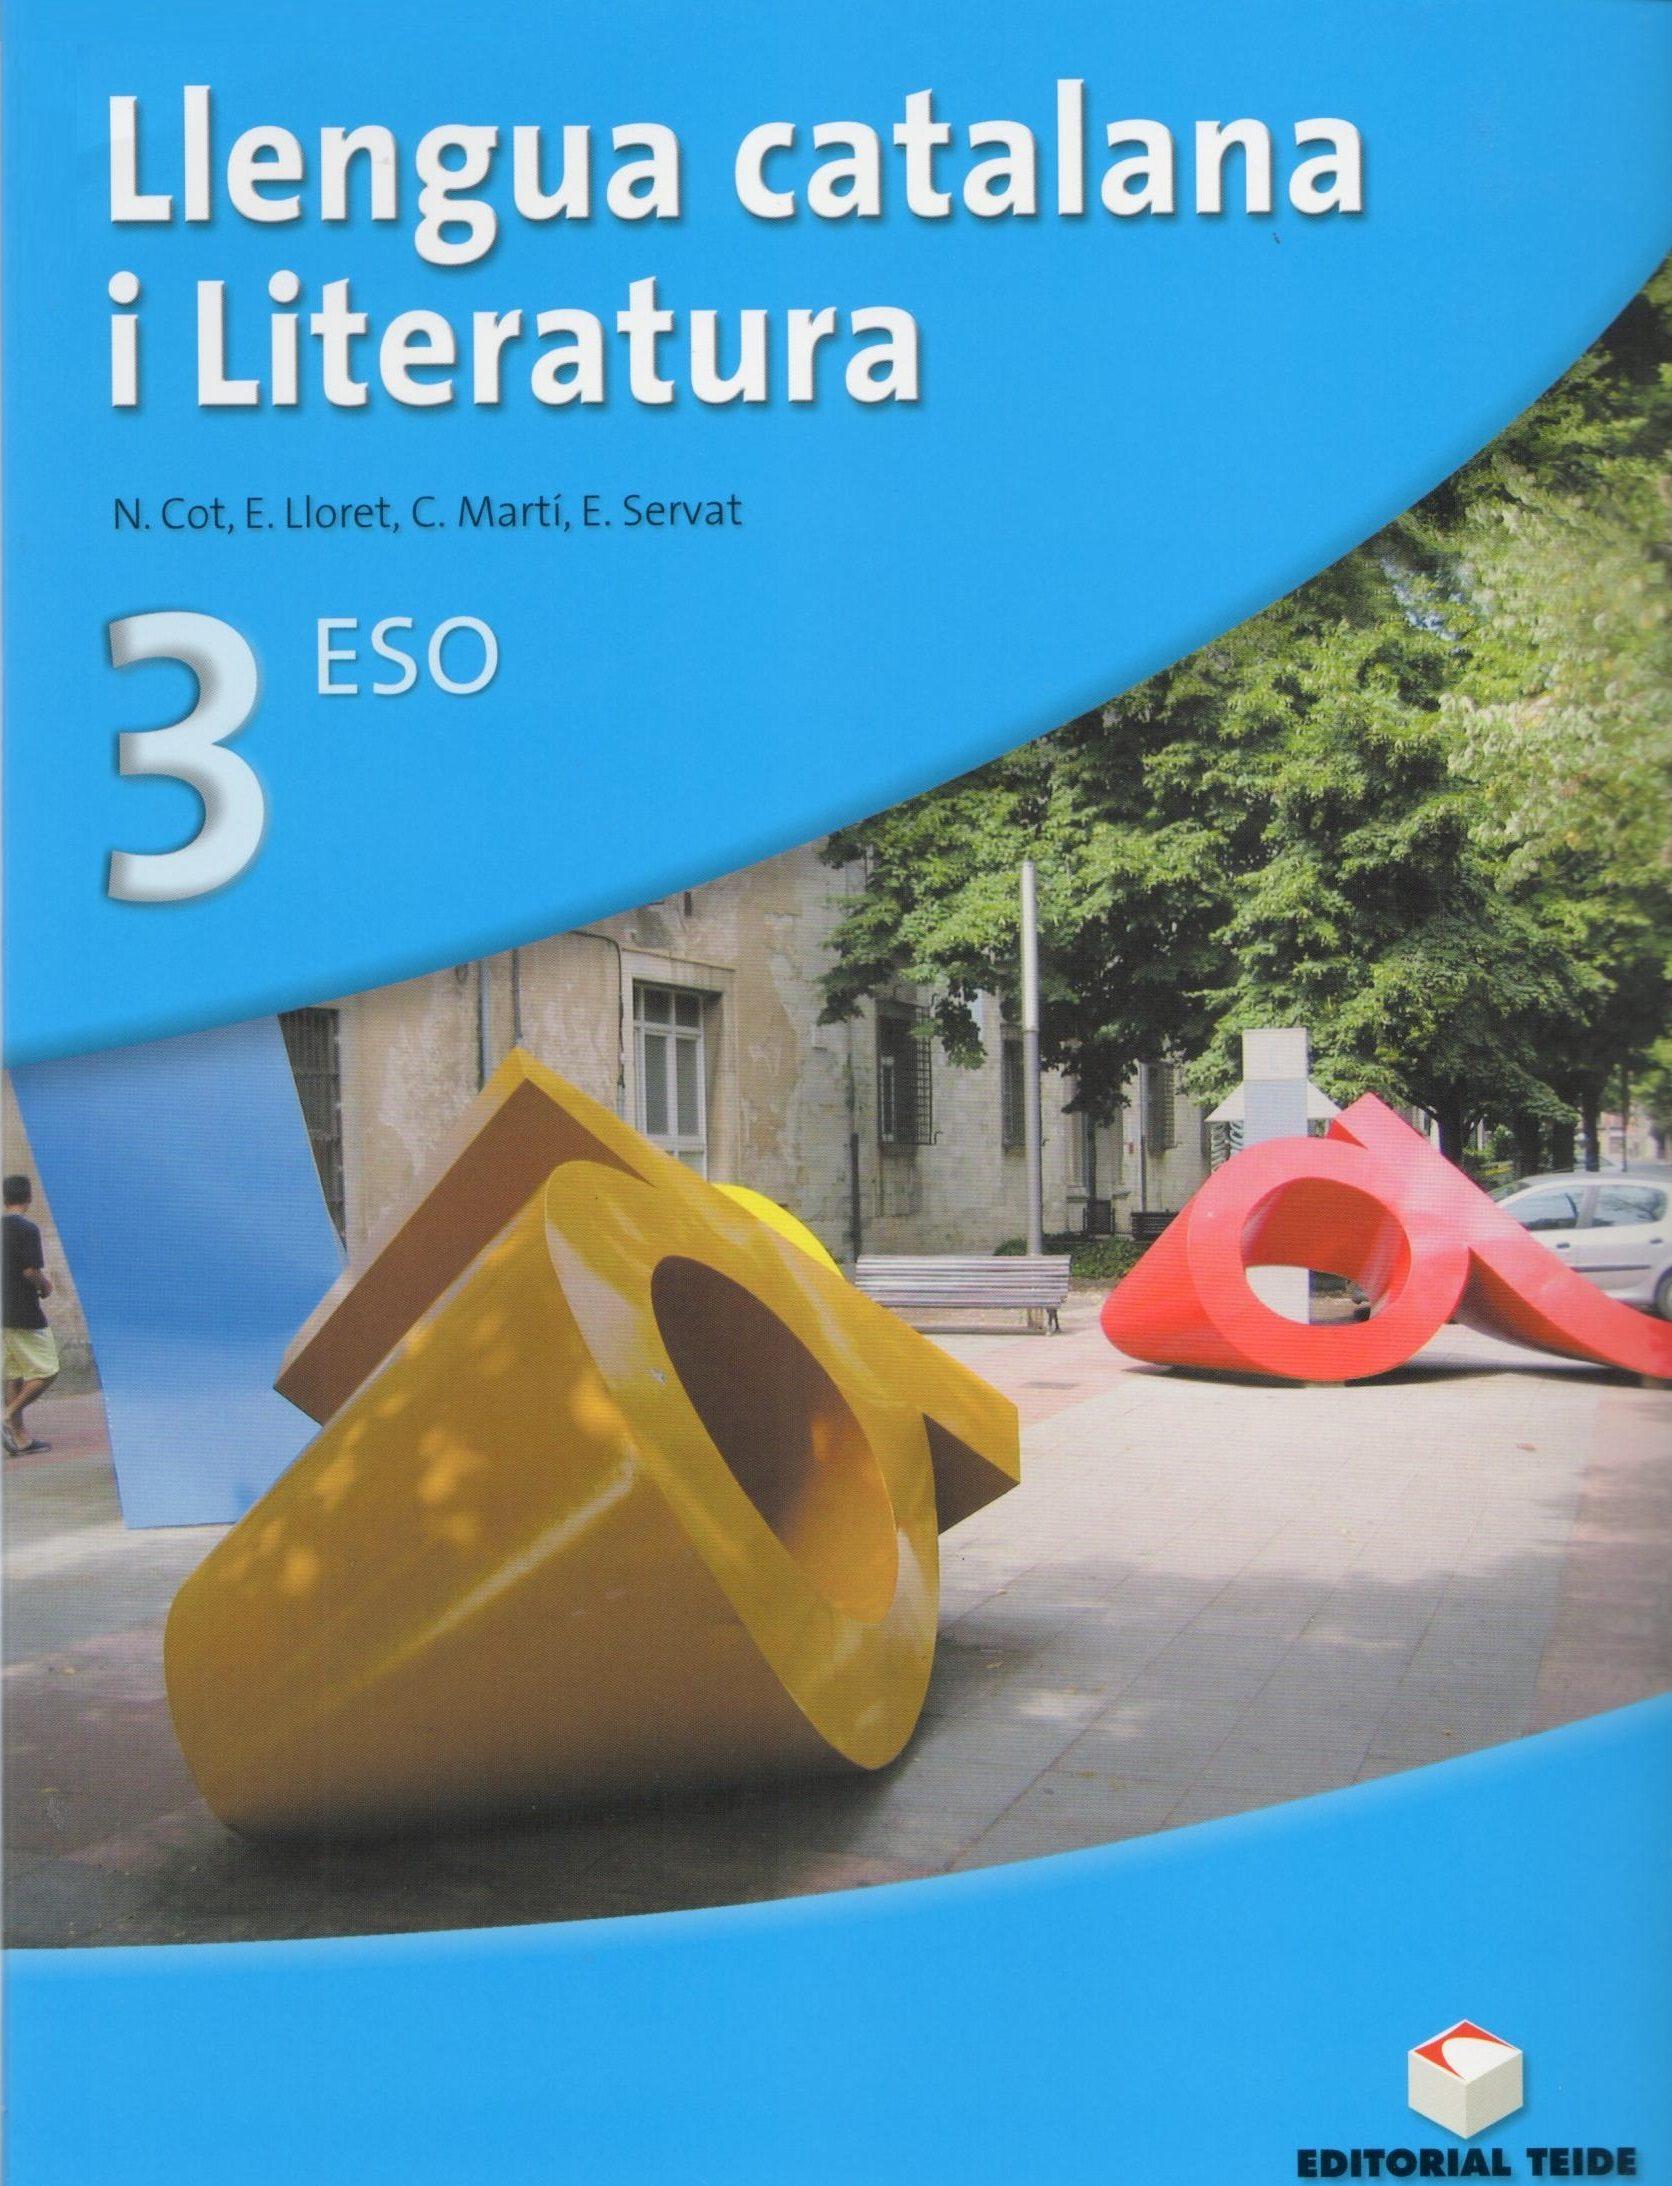 Llengua I Literatura Catalana 3r Eso 2n Cicle por Vv.aa. epub